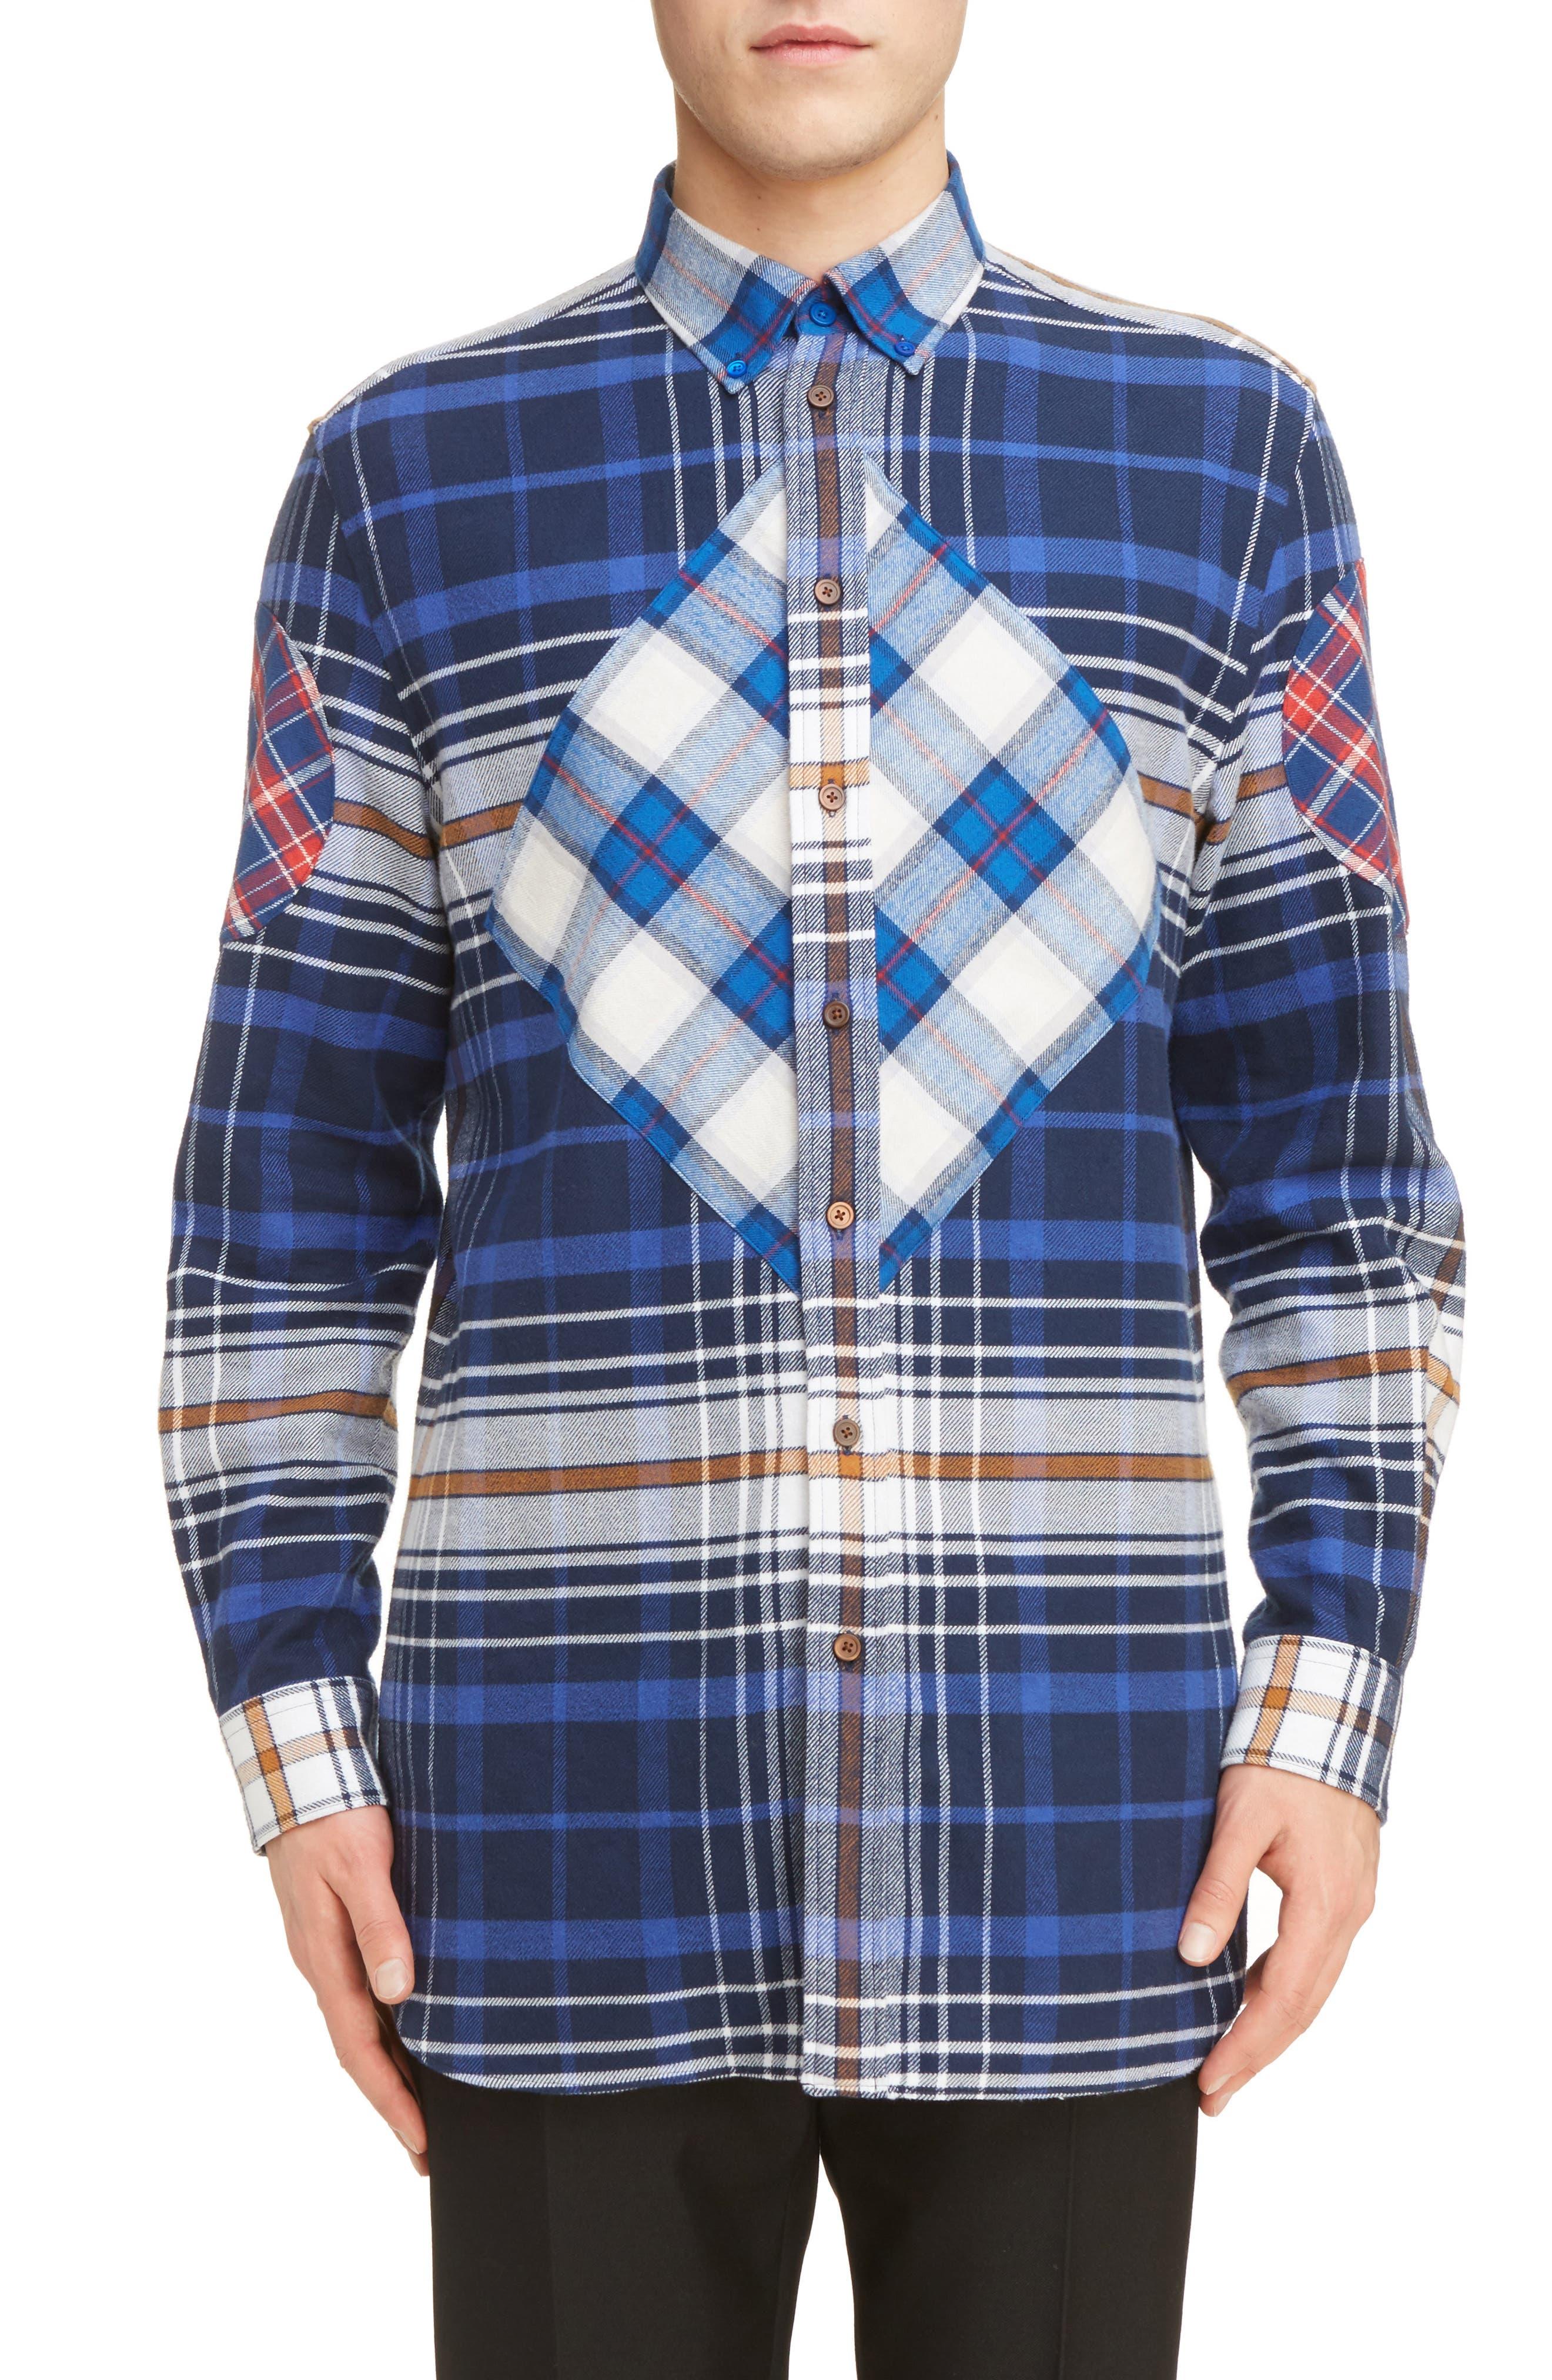 Cuban Fit Pieced Flannel Shirt,                             Main thumbnail 1, color,                             400